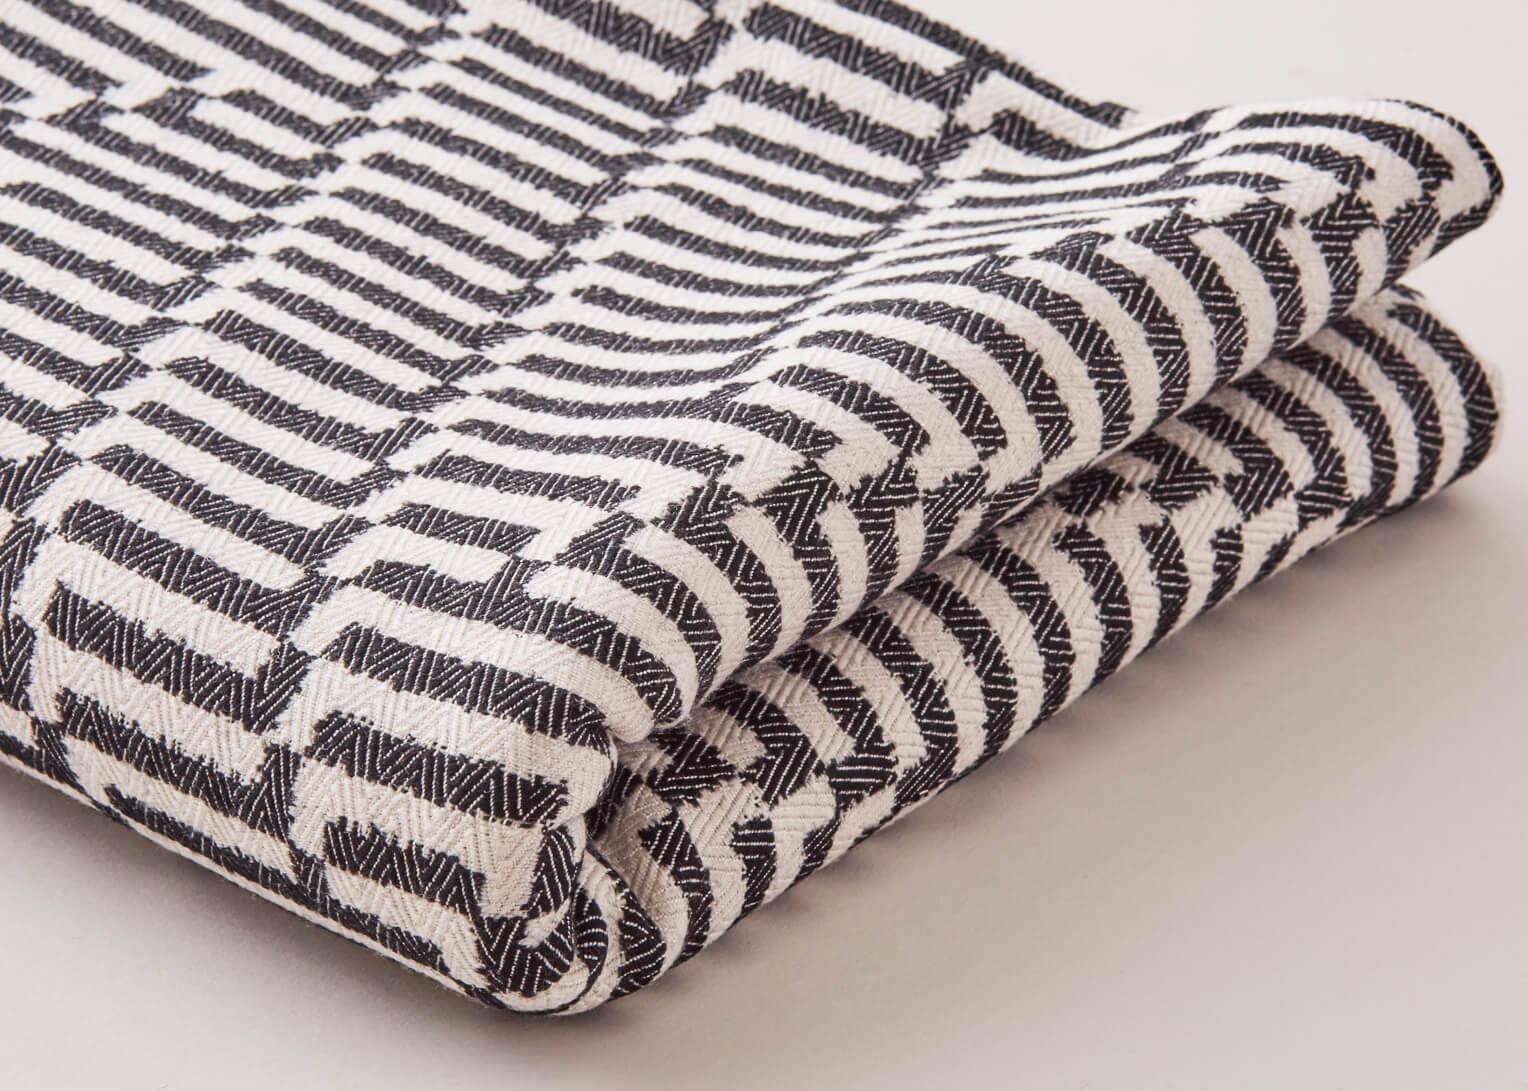 Beatrice Larkin Folded Monochrome Point Throw